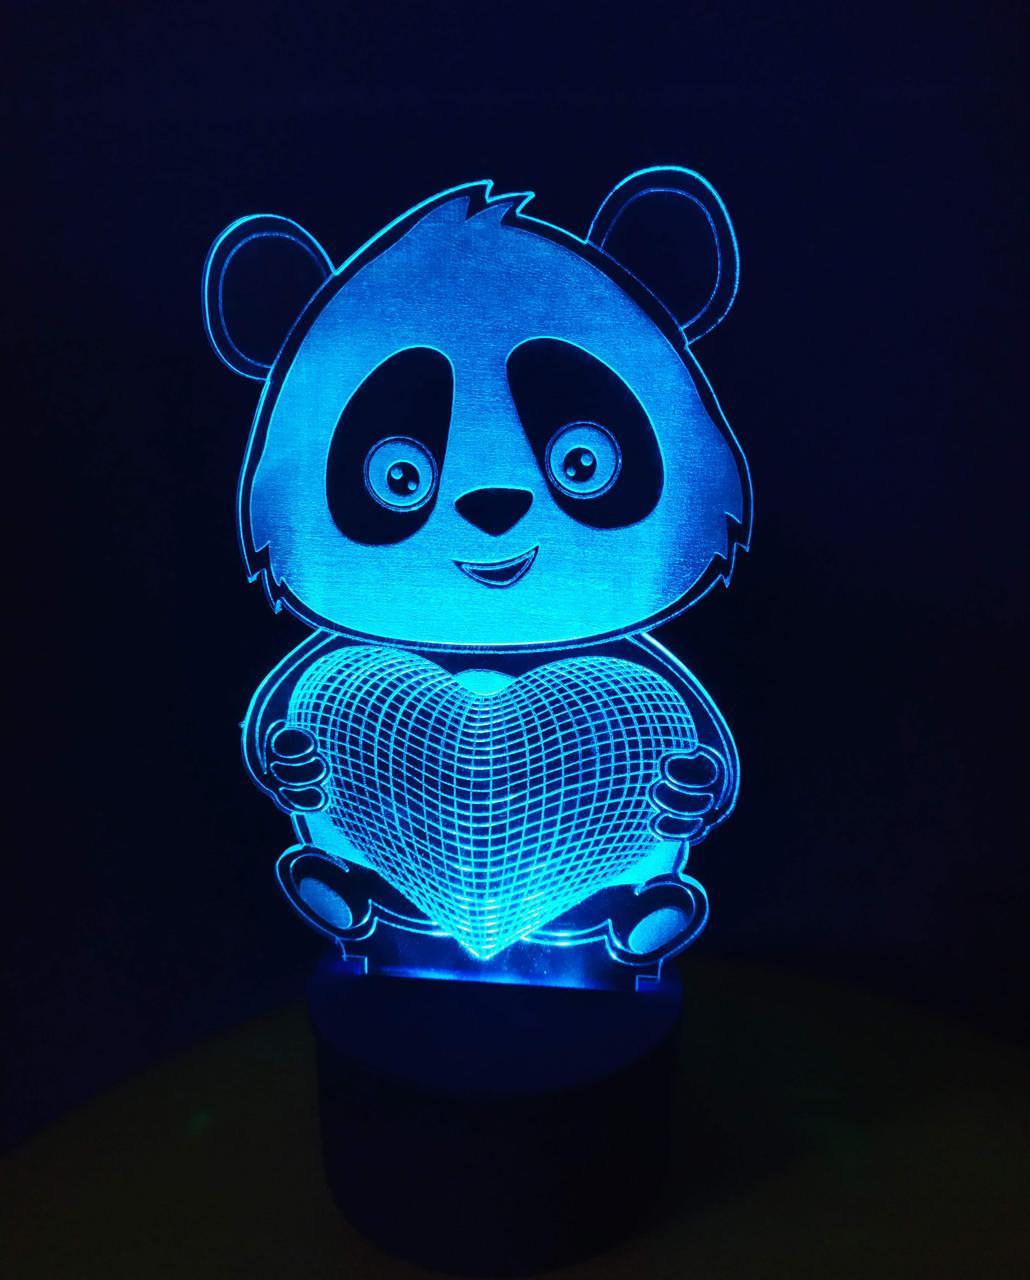 3d-светильник Панда с сердцем, 3д-ночник, несколько подсветок (батарейка+220В)